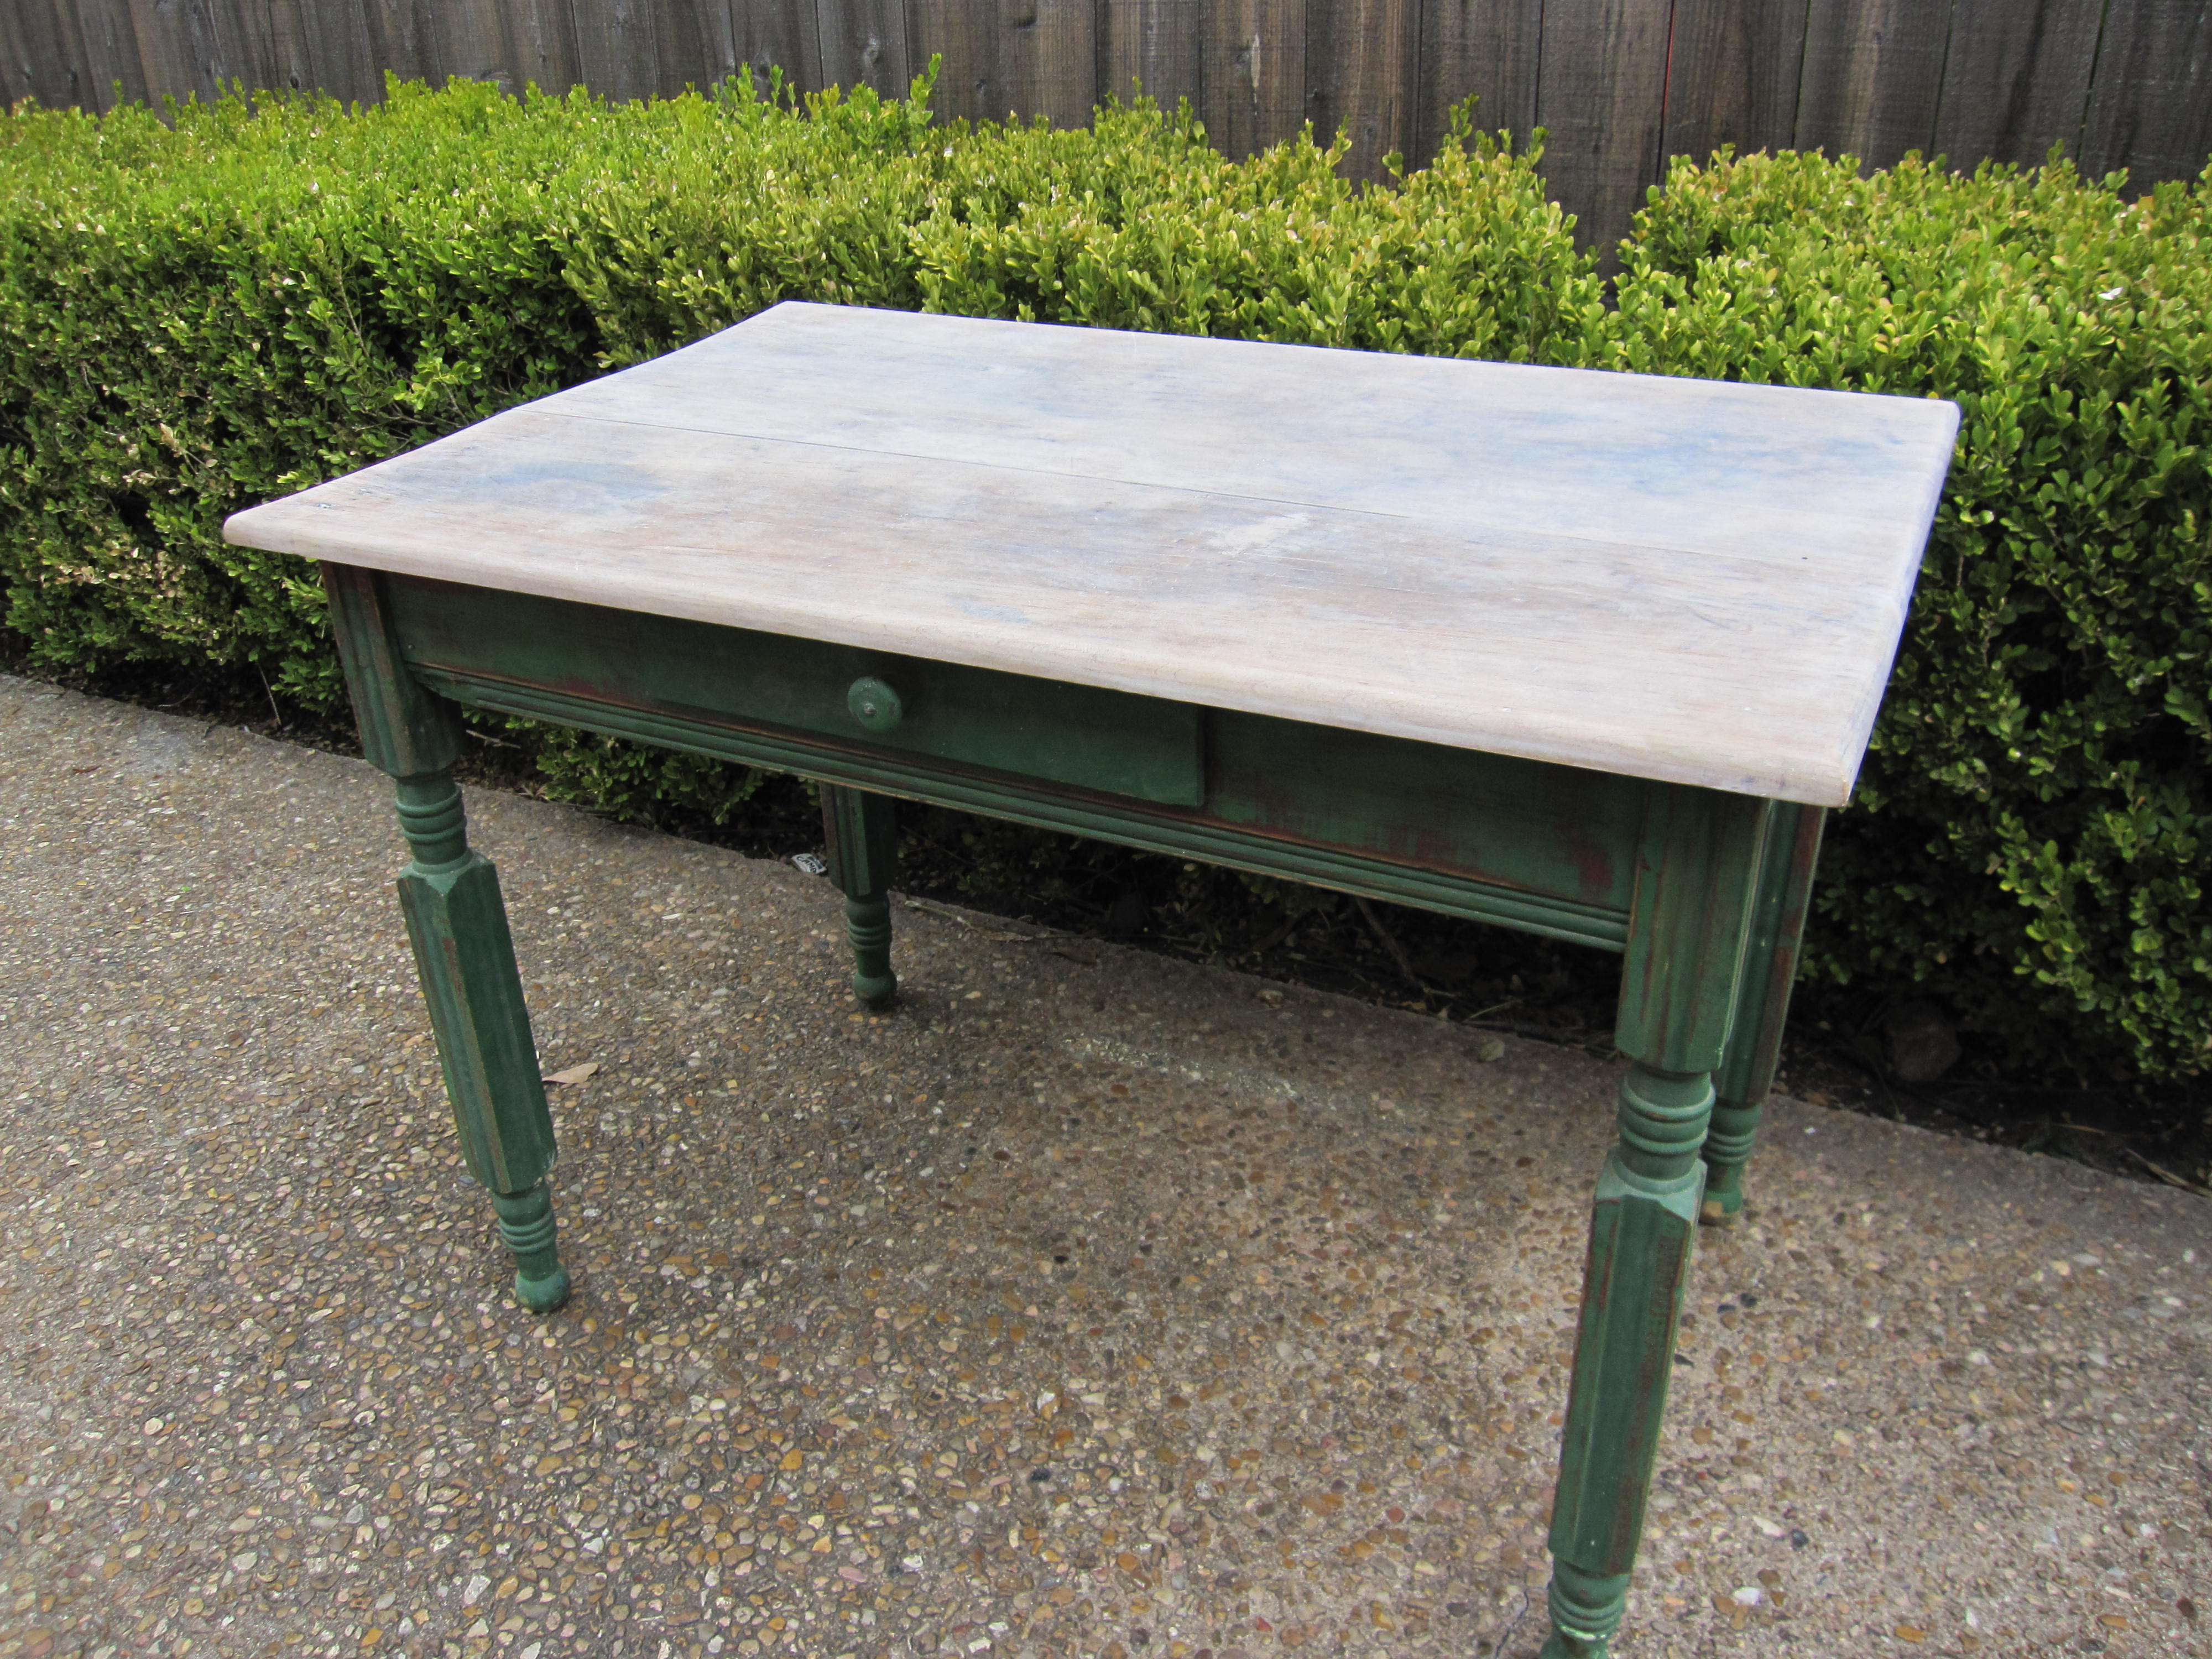 sweet garden table - Refinishing Wood Table